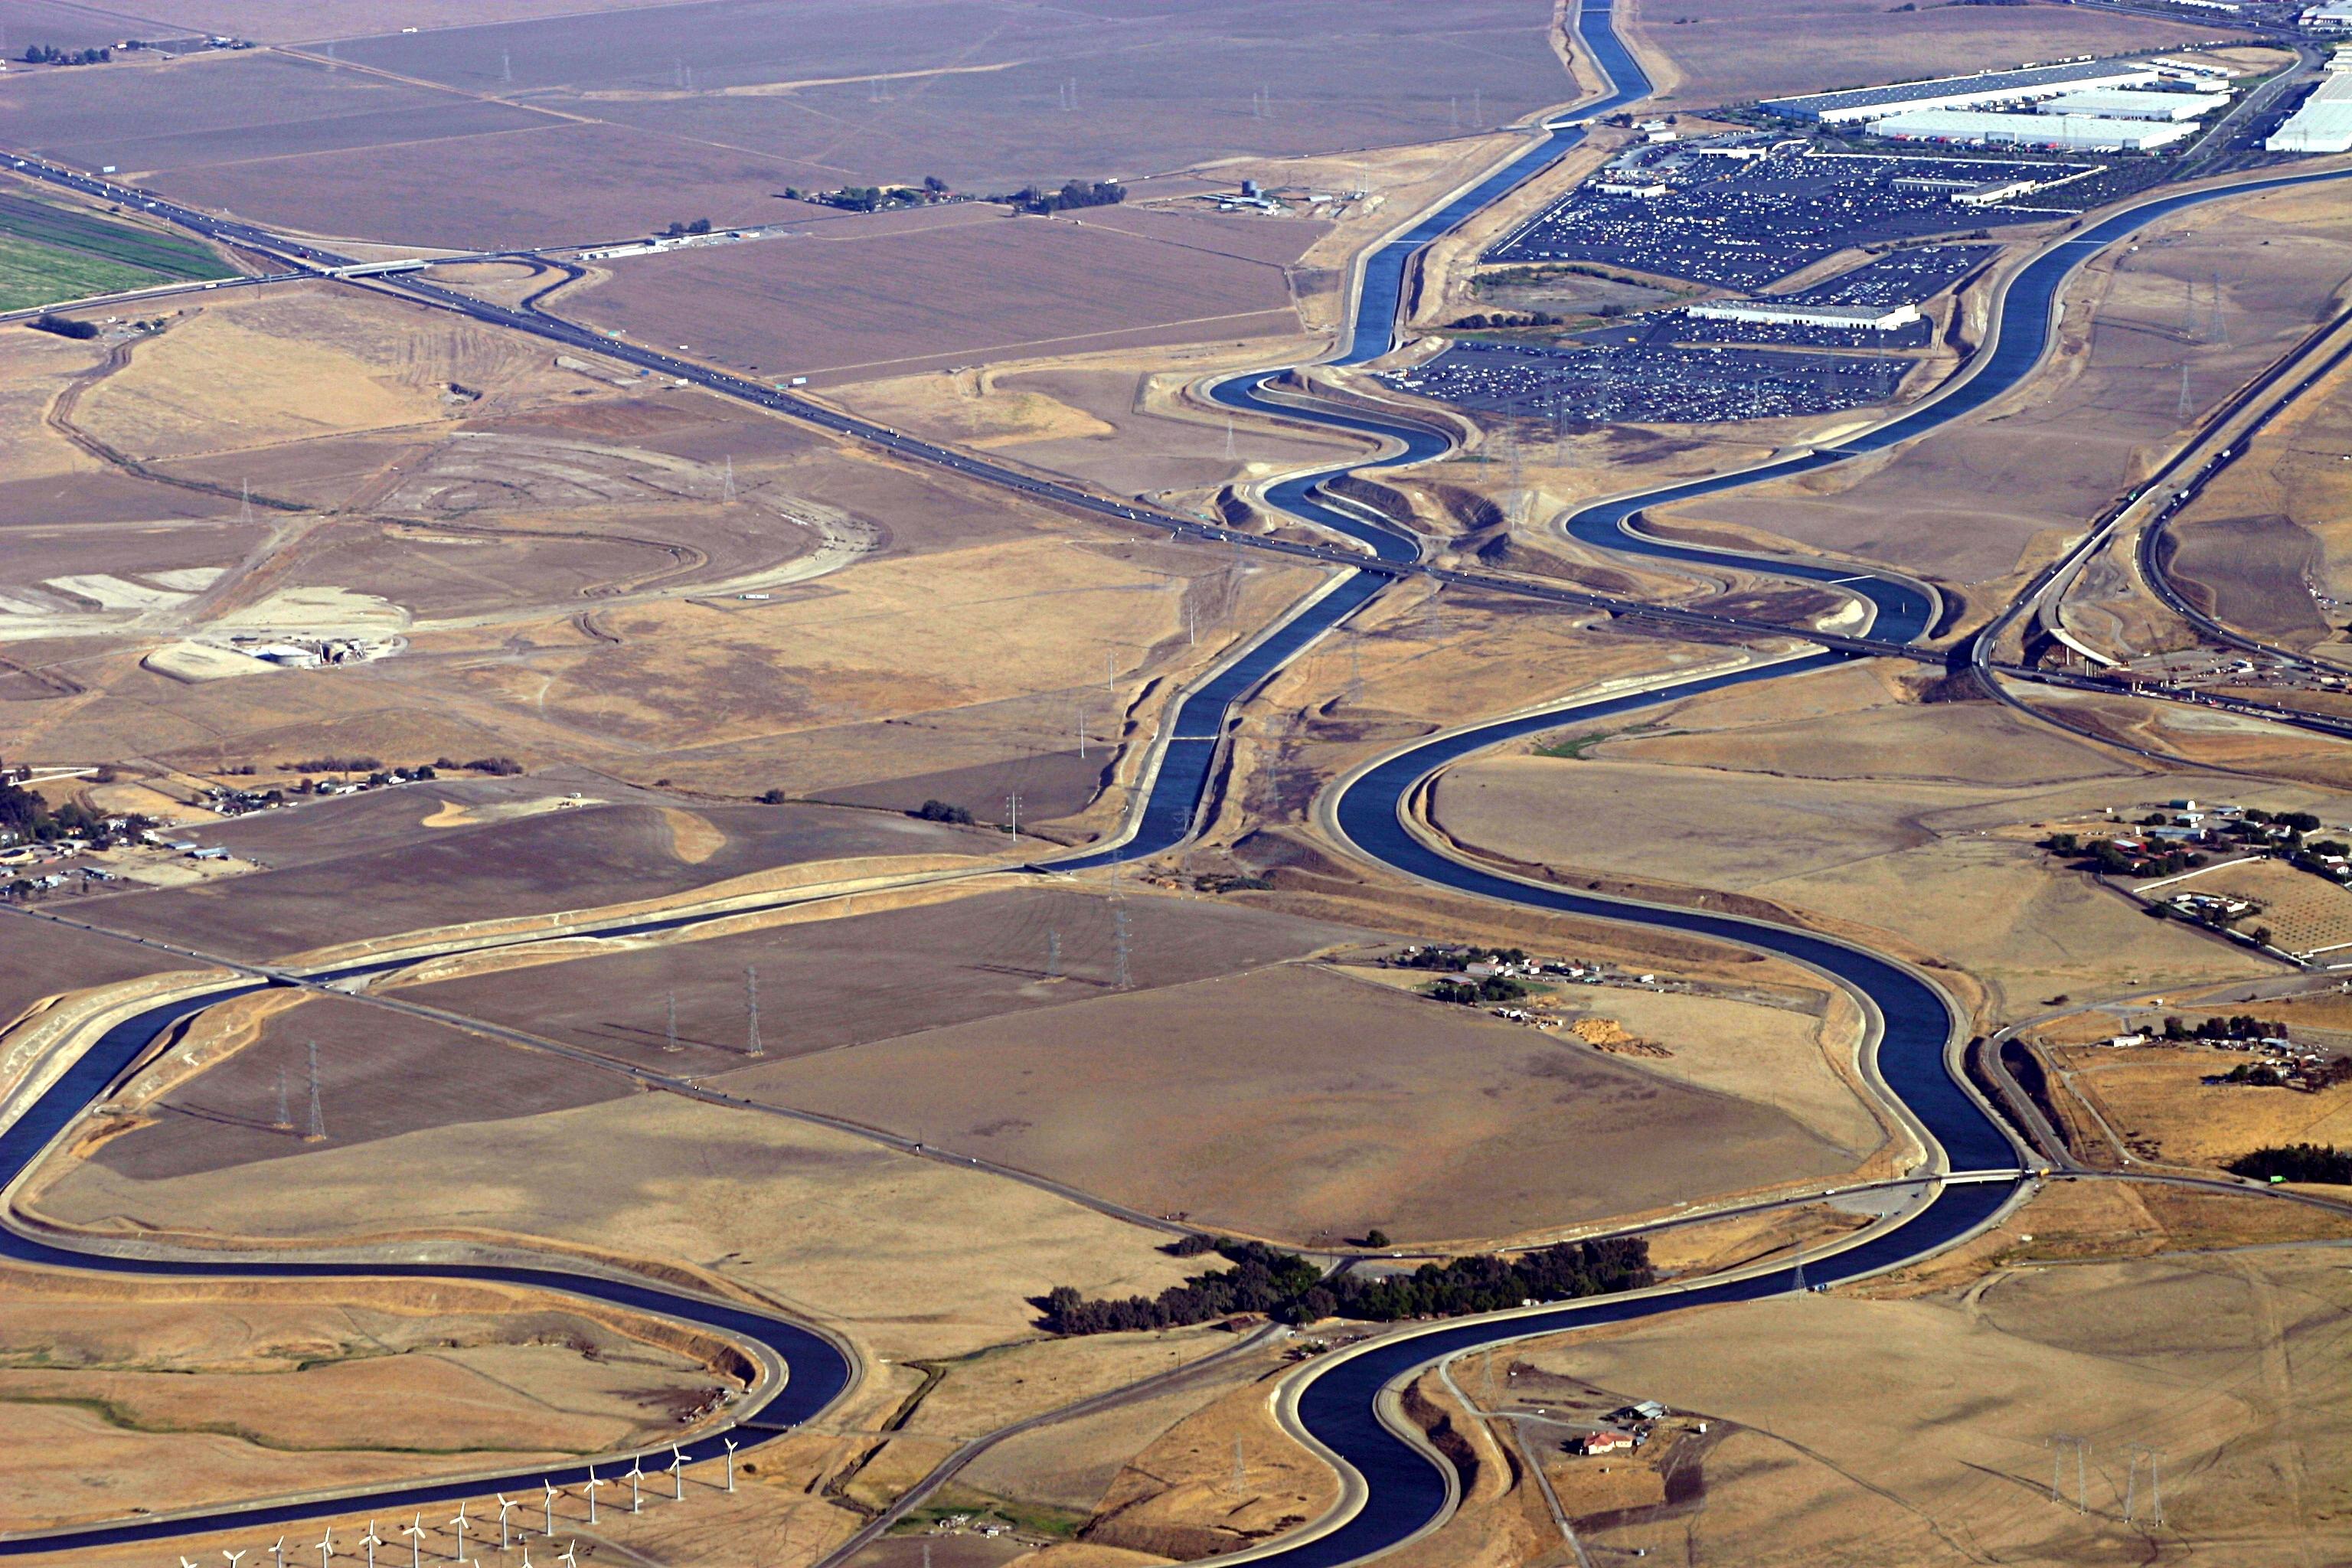 Калифорнийский акведук (справа) иканал Дельта—Мендота (слева)